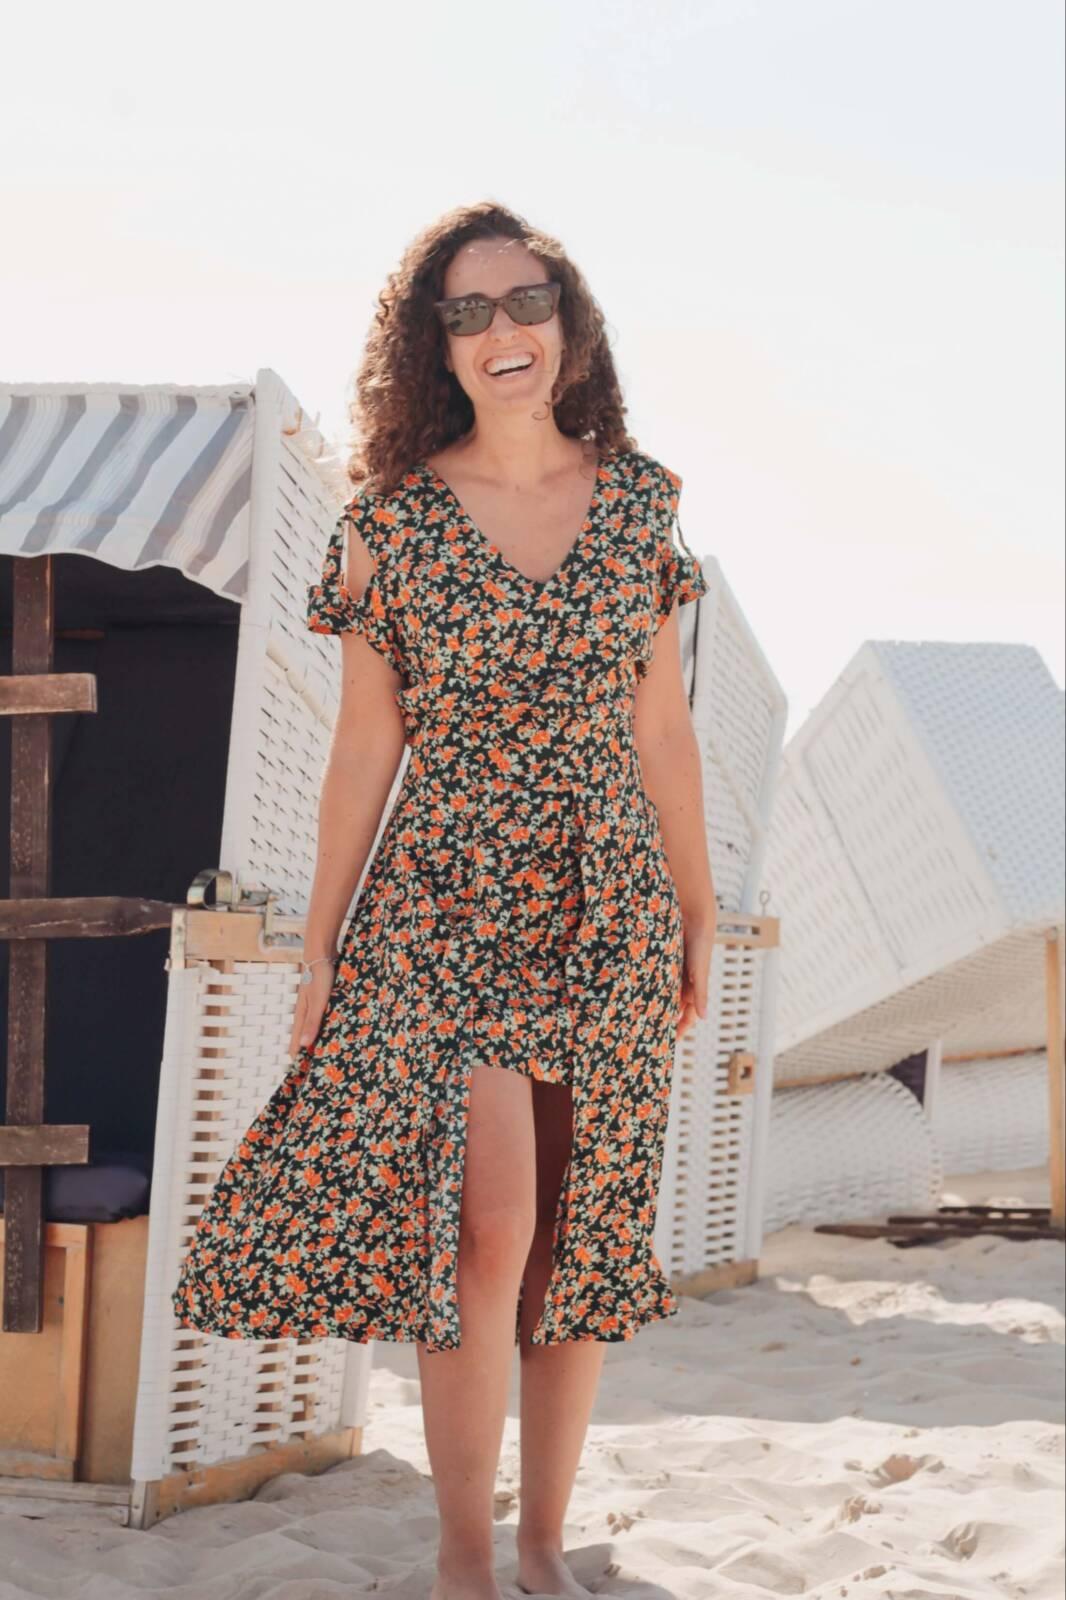 Boho Blumenkleid Asymmetrisch Cut Out Kleid